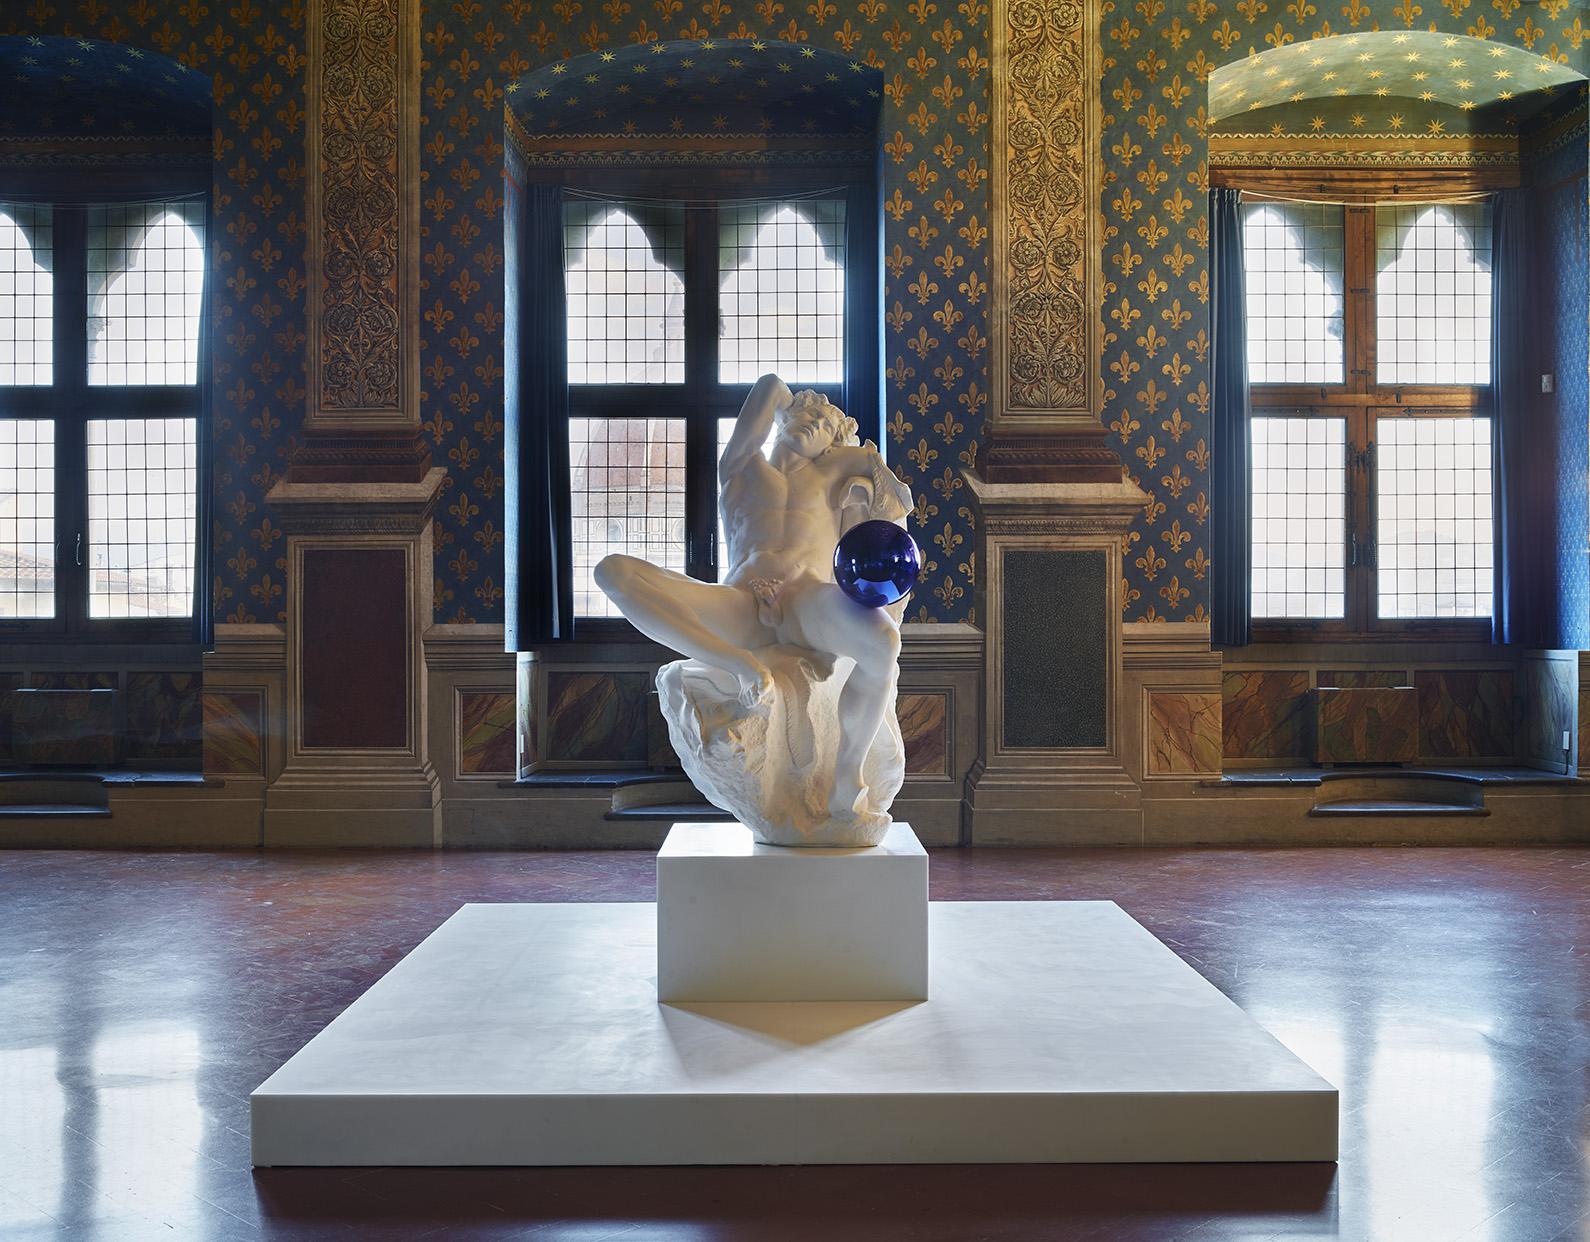 Jeff Koons in Florence. Un dialogo tra Rinascimento e contemporaneità